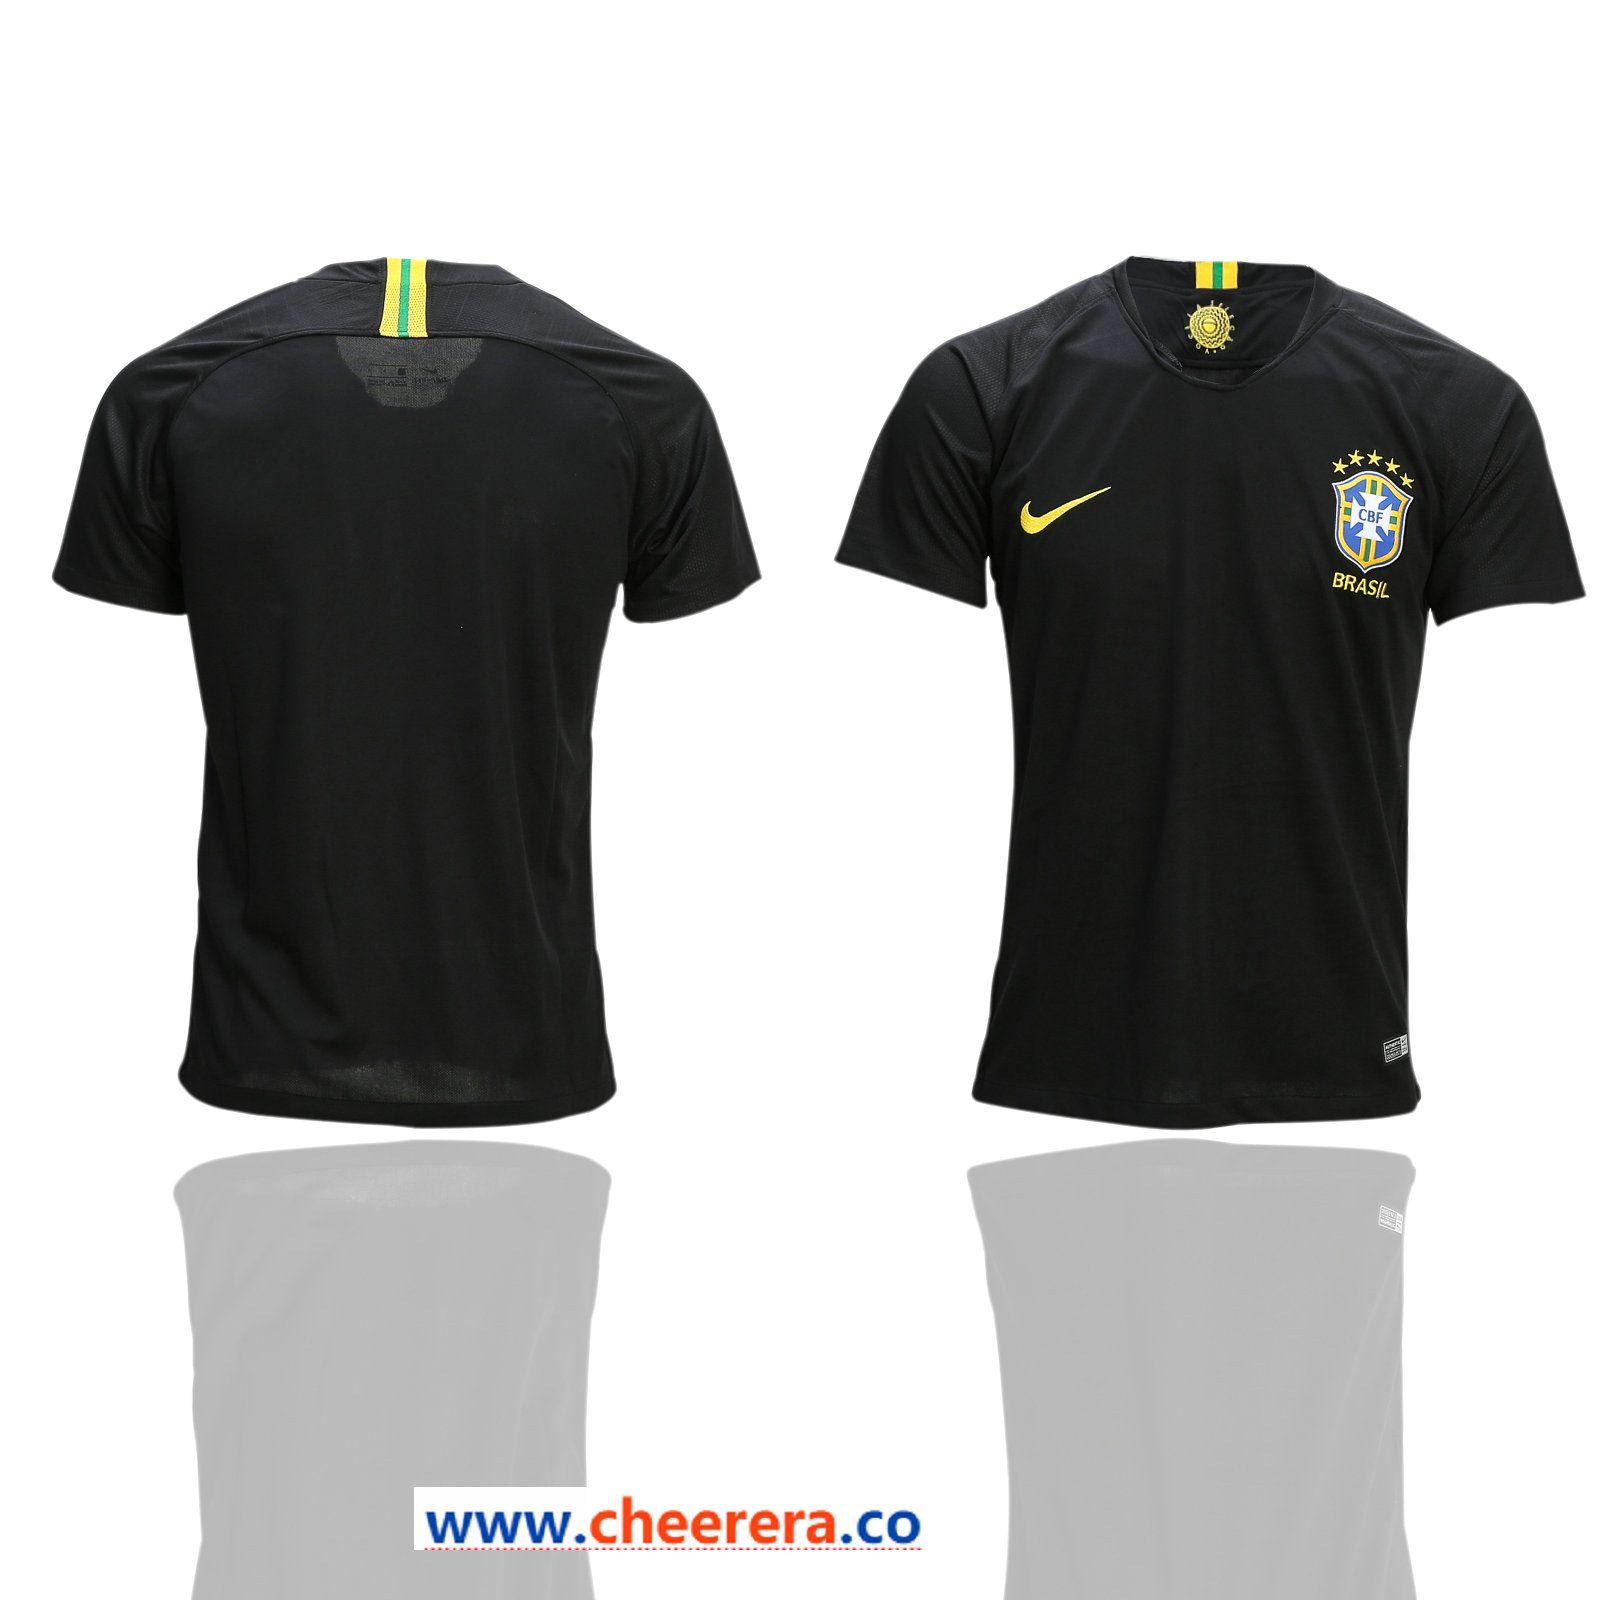 be09ccfe973 Brazil Black Goalkeeper 2018 FIFA World Cup Thailand Soccer Jersey ...